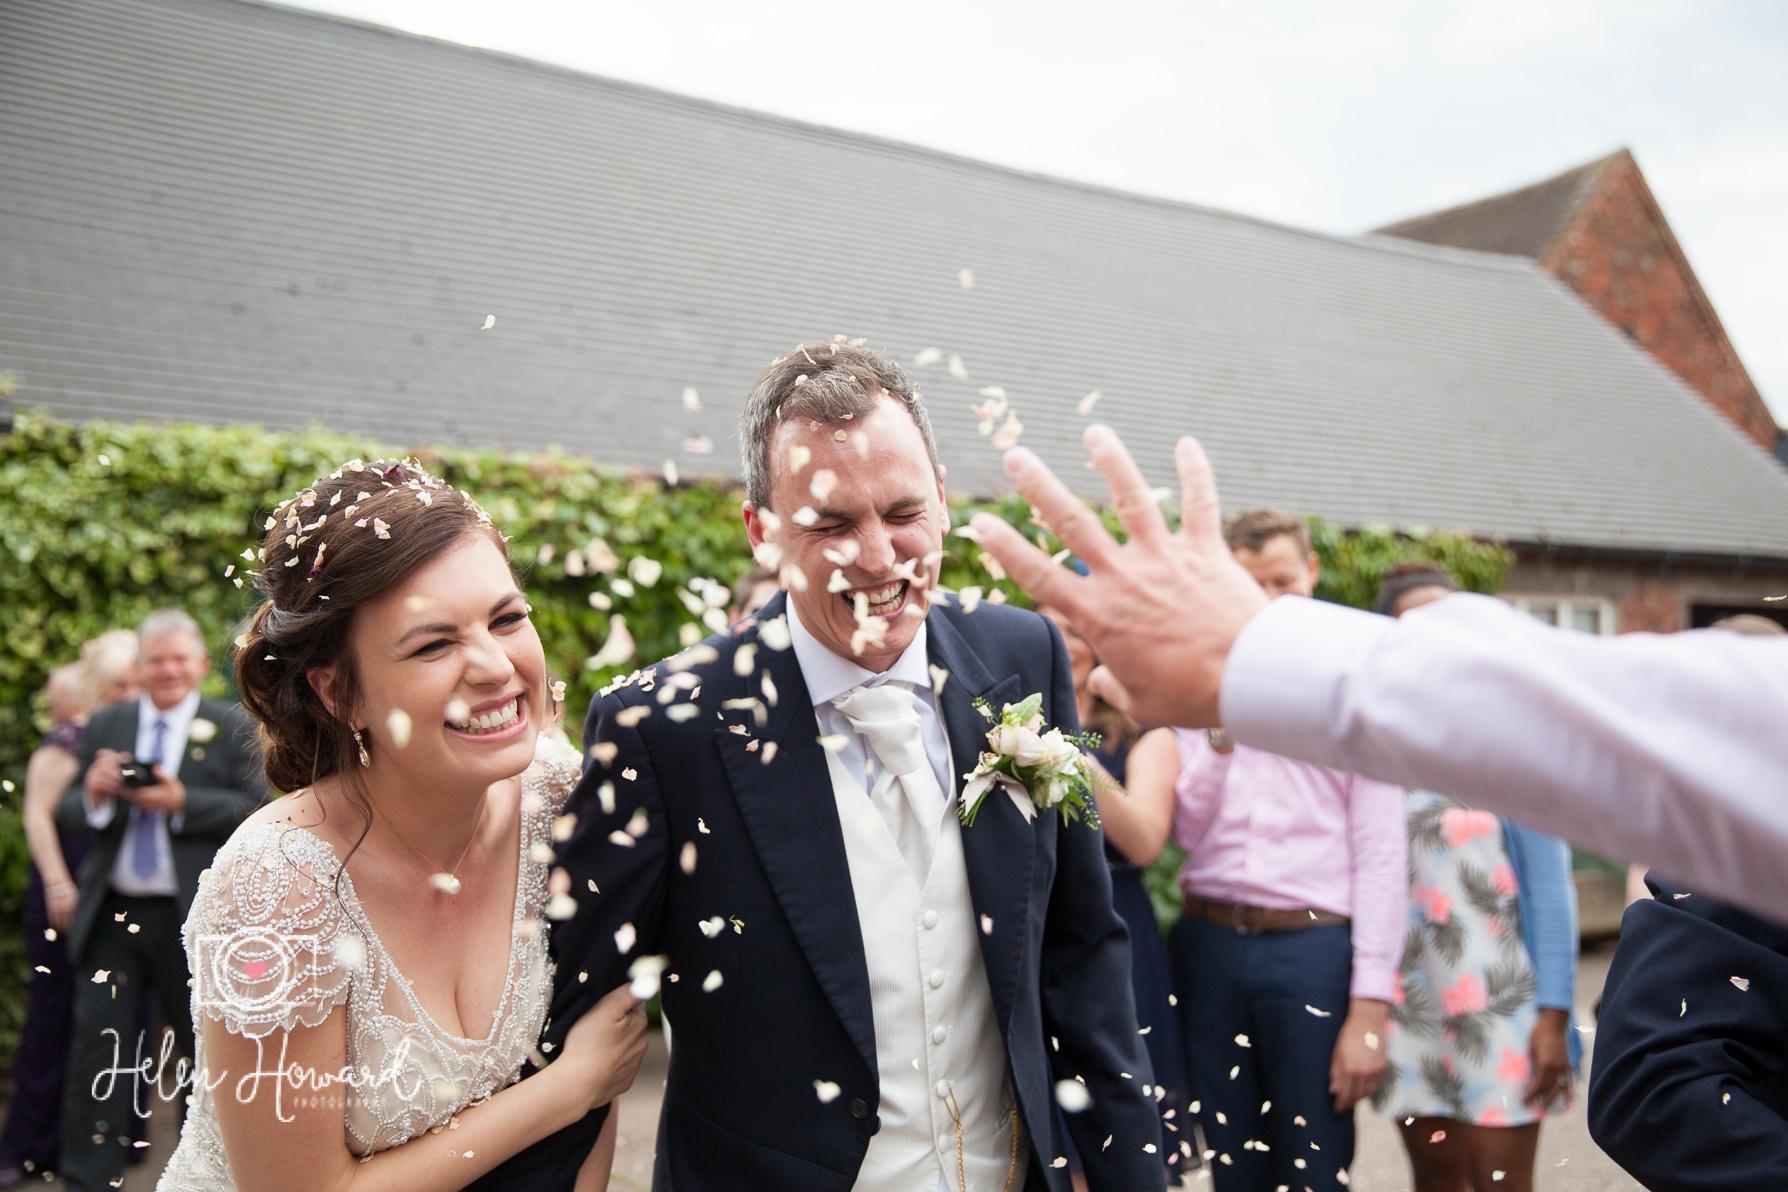 Helen Howard Photography Packington Moor Wedding-101.jpg